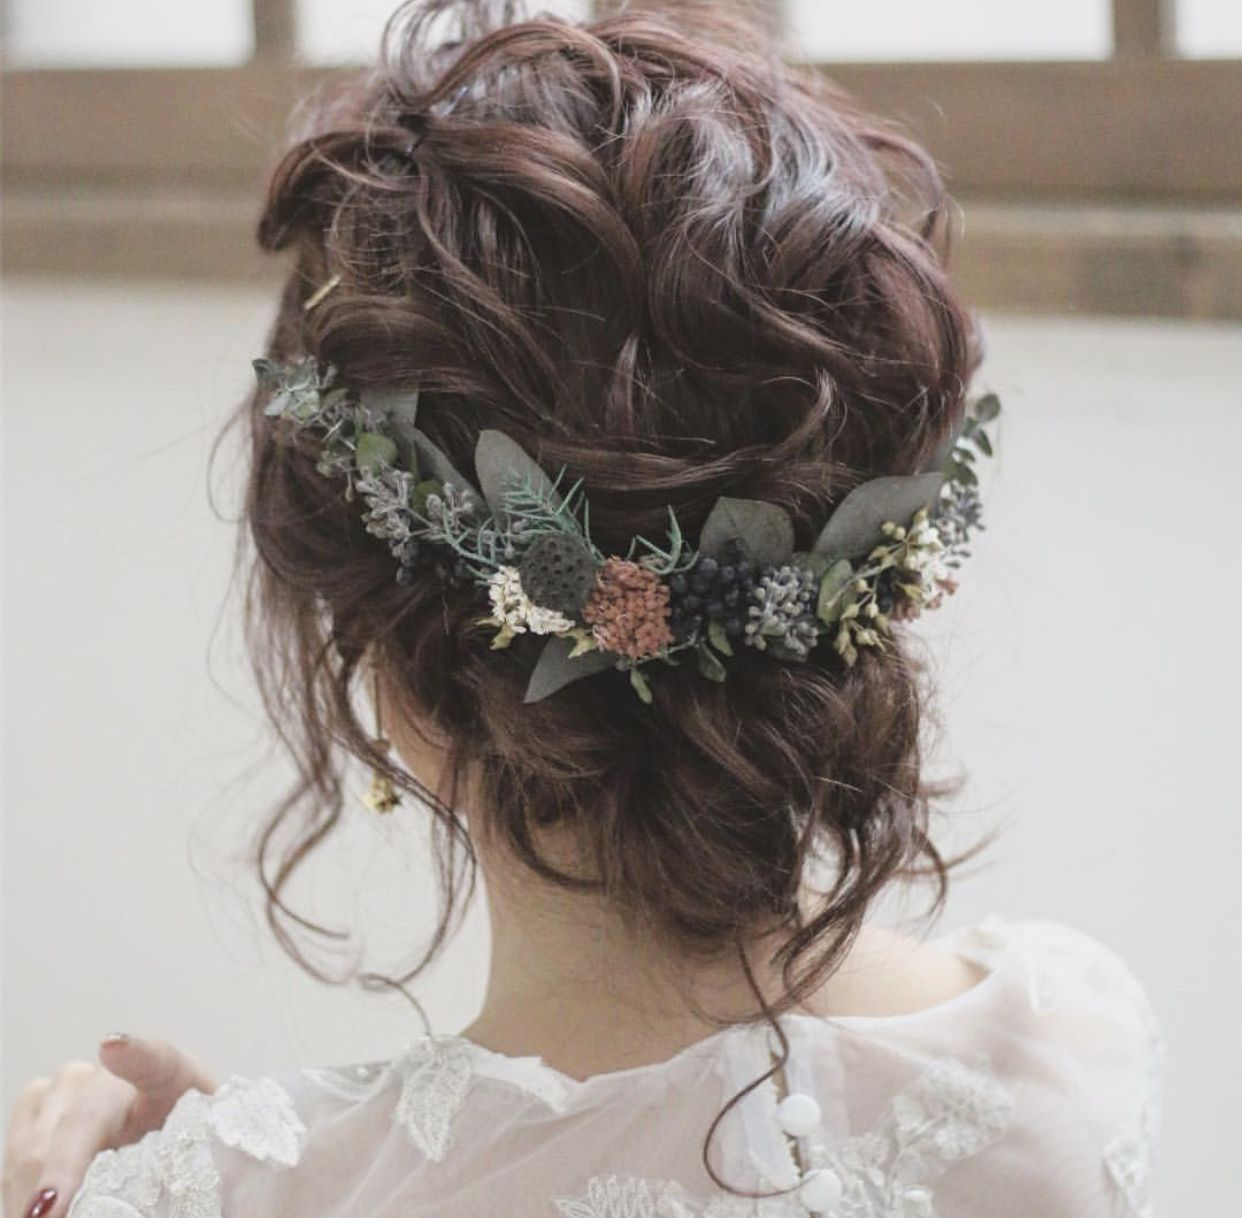 whimsical / bohemian / romantic | romantic s t y l e s in